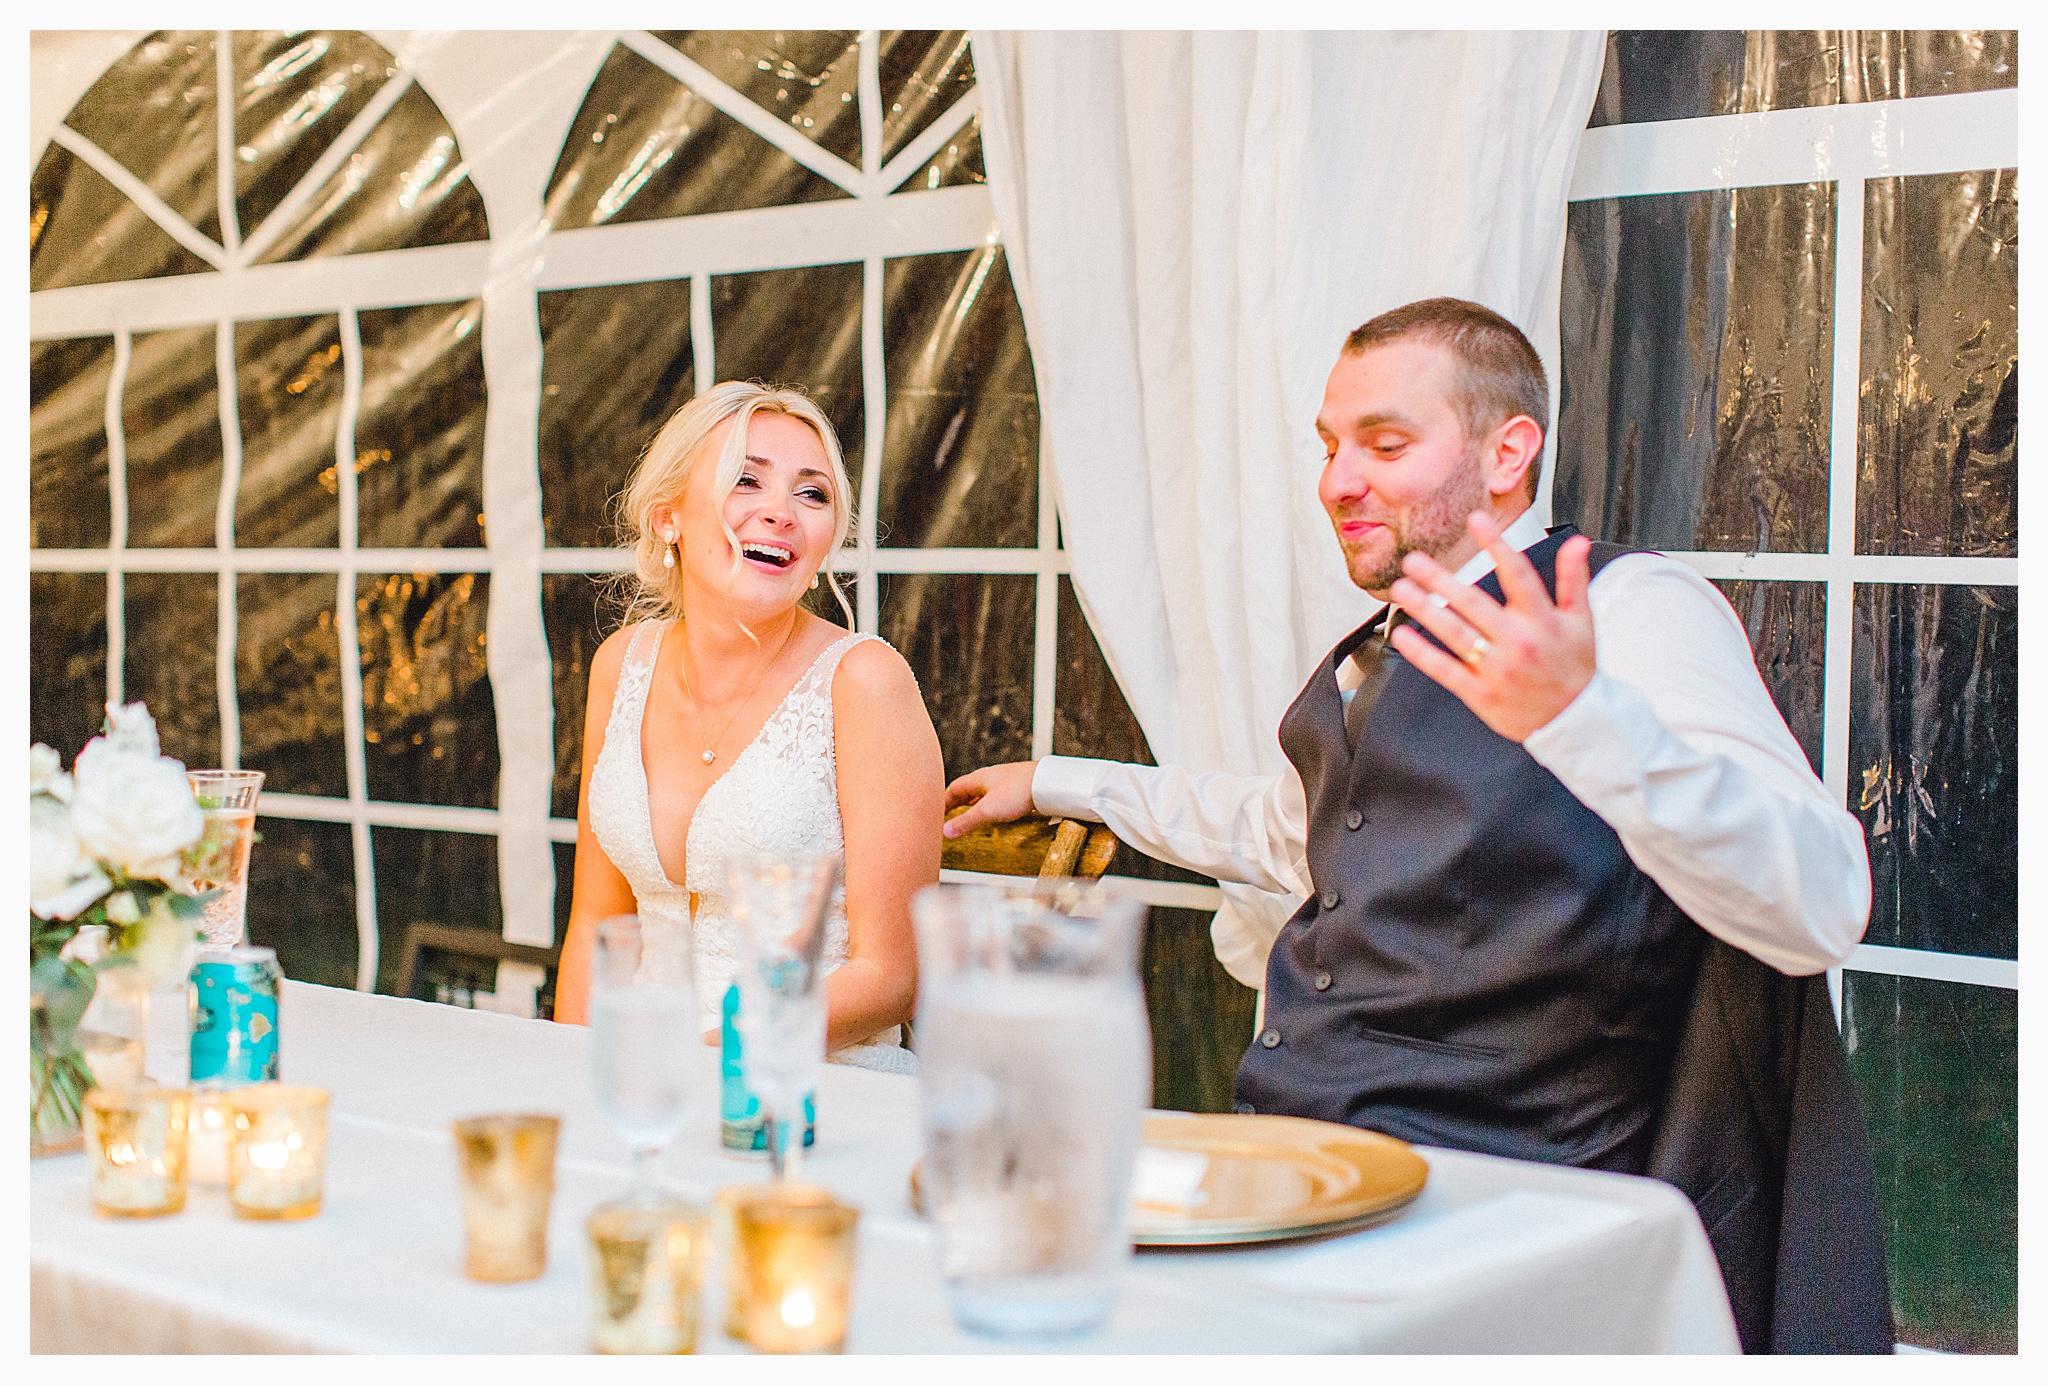 Emma Rose Company Light and Airy Wedding Photographer, Beautiful fall wedding at Rock Creek Gardens Venue in Puyallup, Washington._0100.jpg